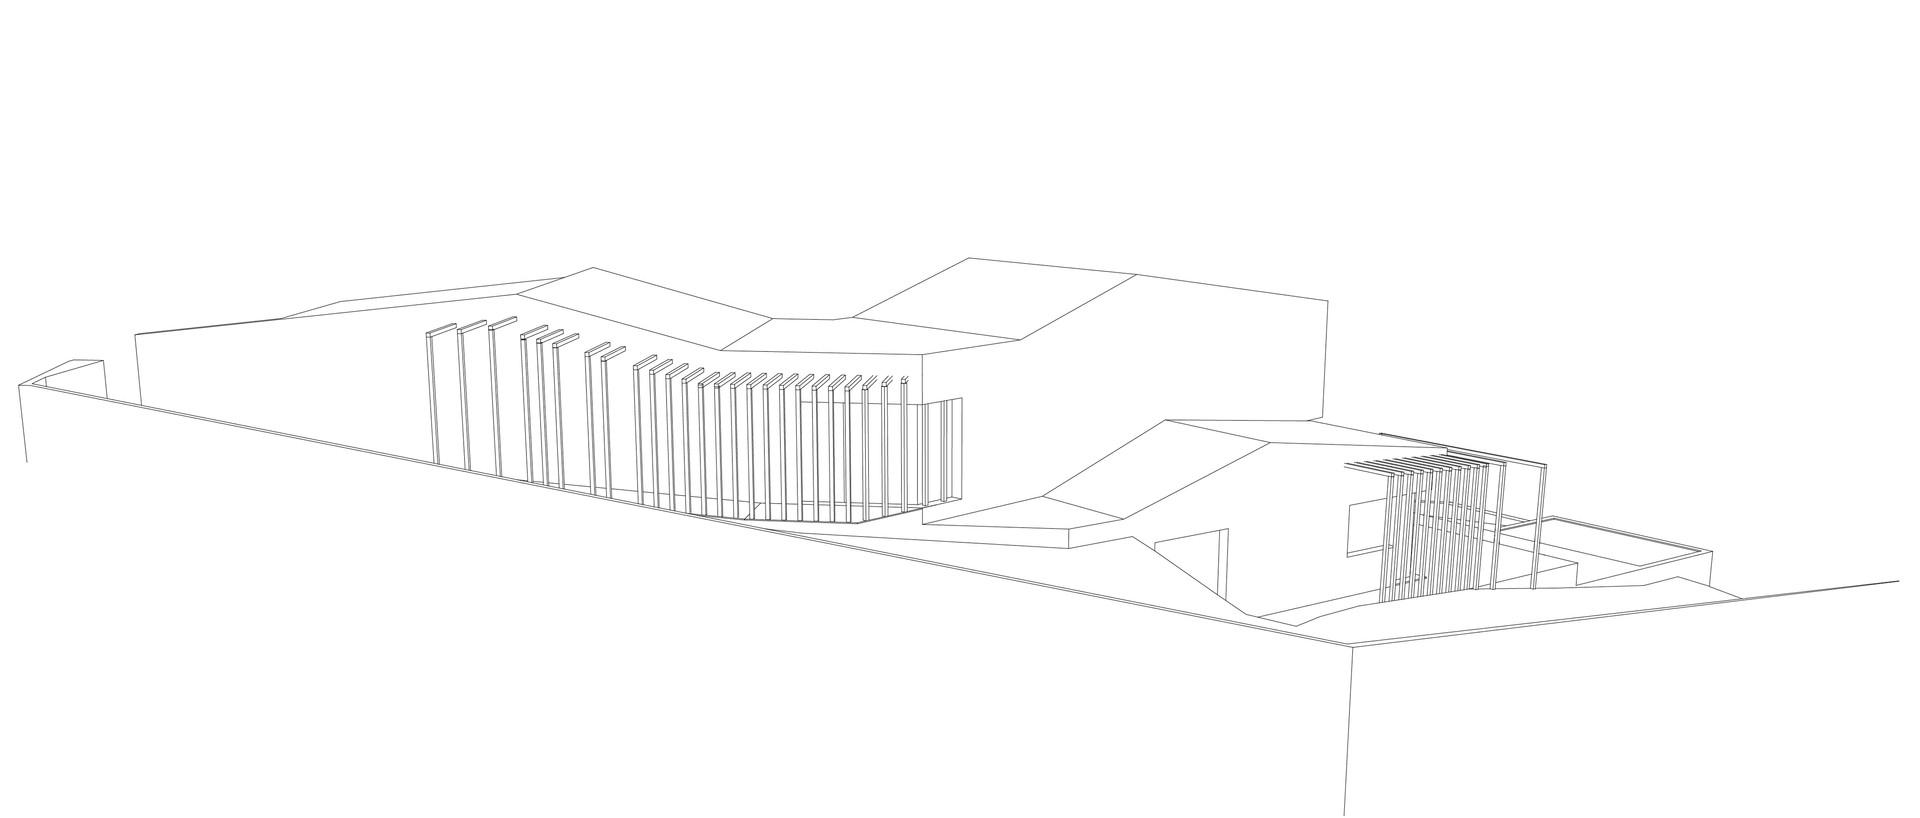 3D_HORTUS_ENVOLVENTE1-01_copy_cópia.jpg